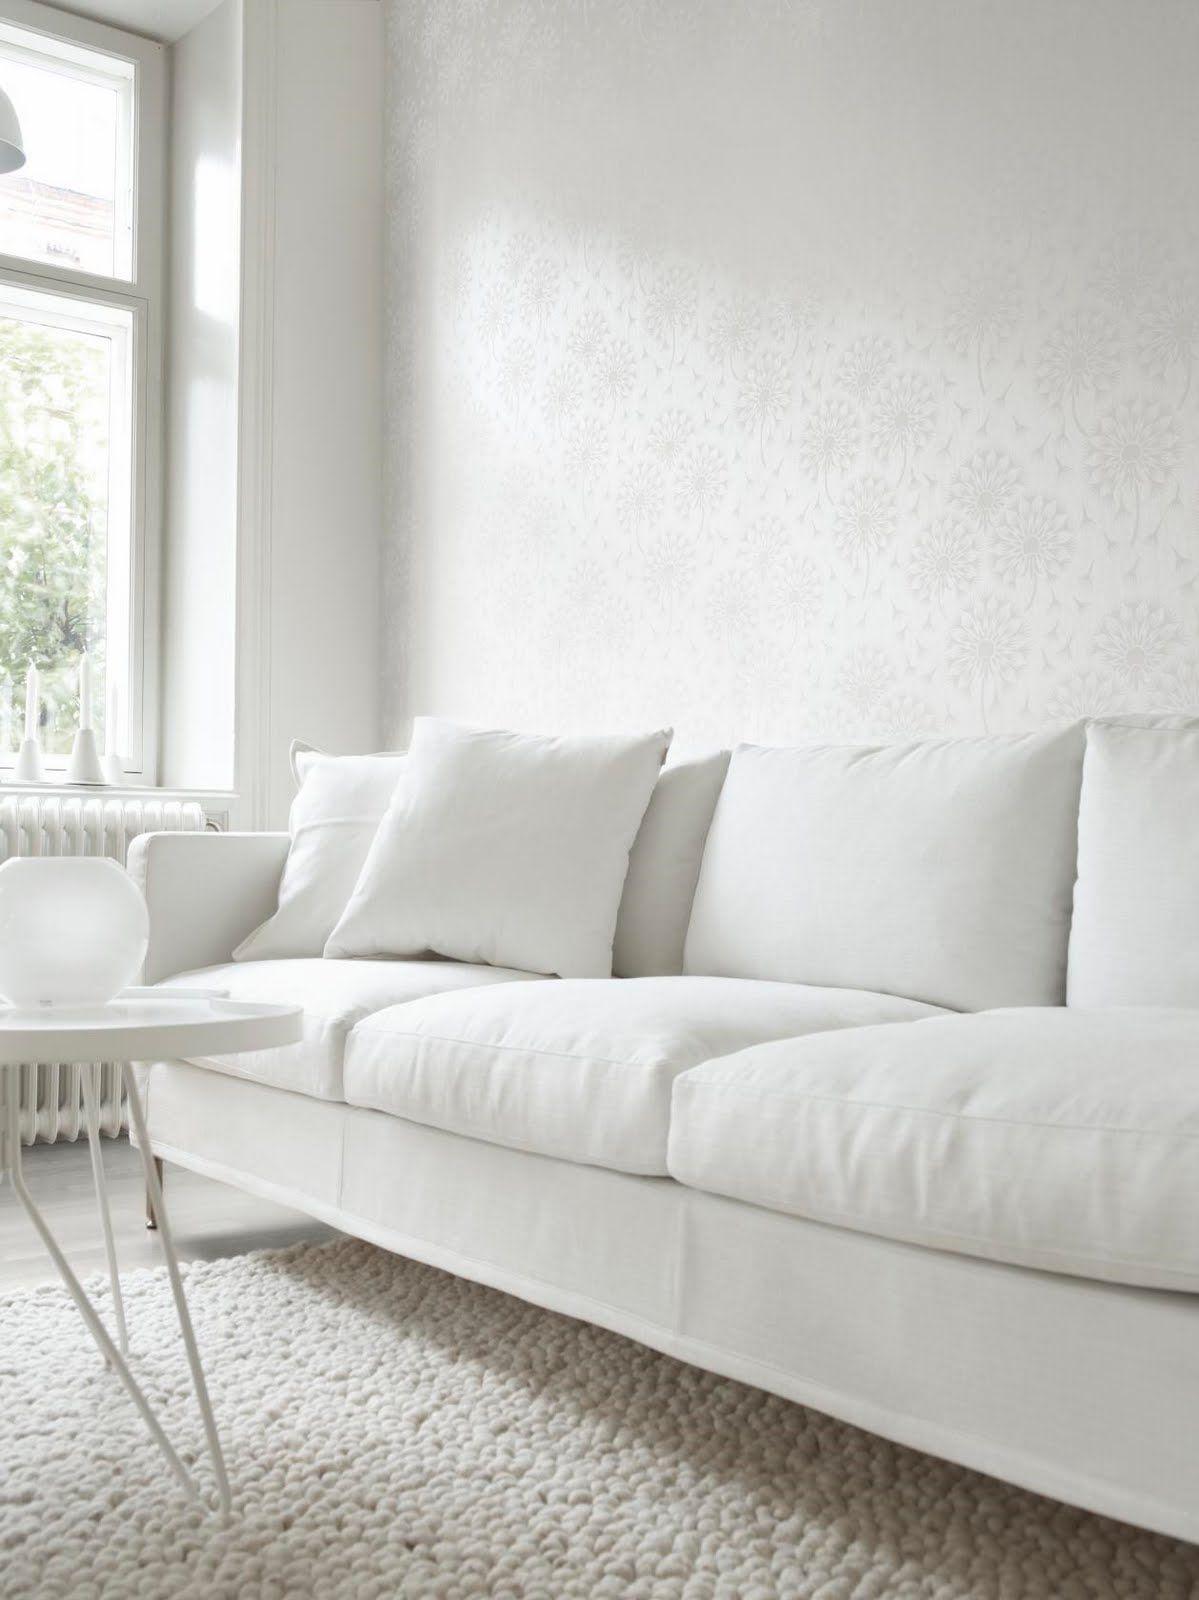 All White Interior Design Of The Homewares Designer Home: Best-inspirations : Sofa And Interior Design White Walls